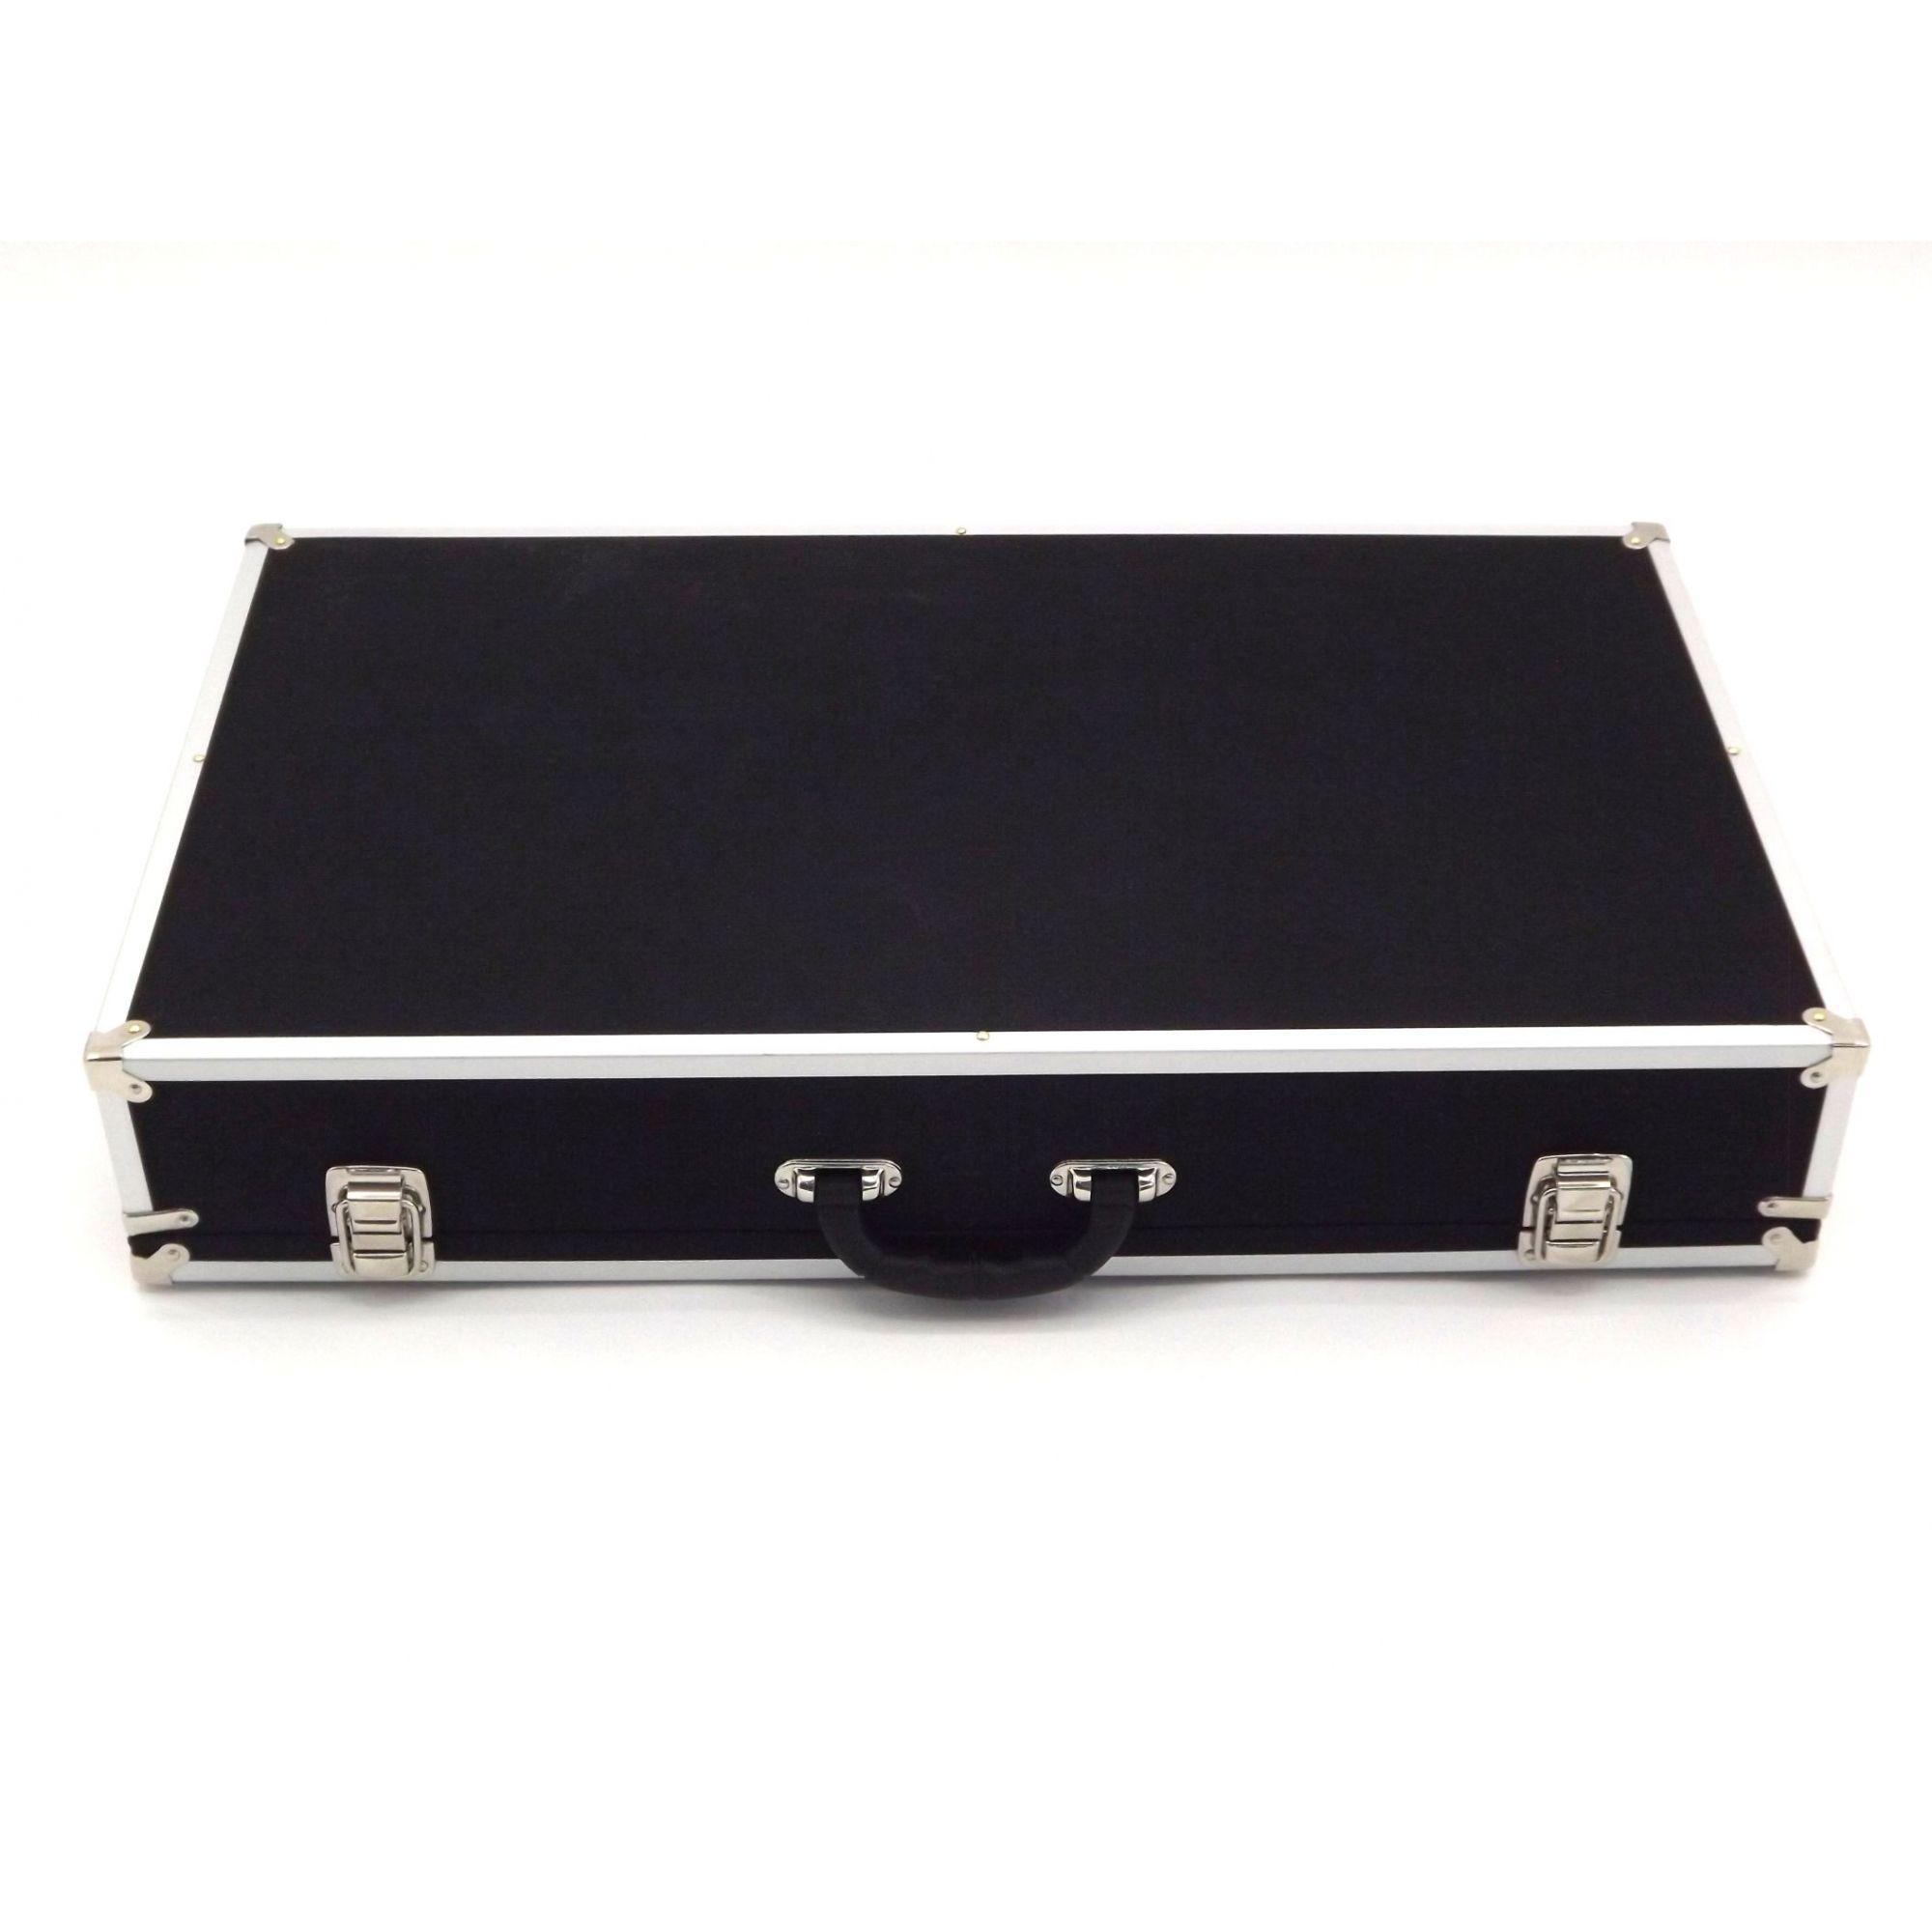 Case Pedais Pedaleira 60x33x10cm Super Luxo